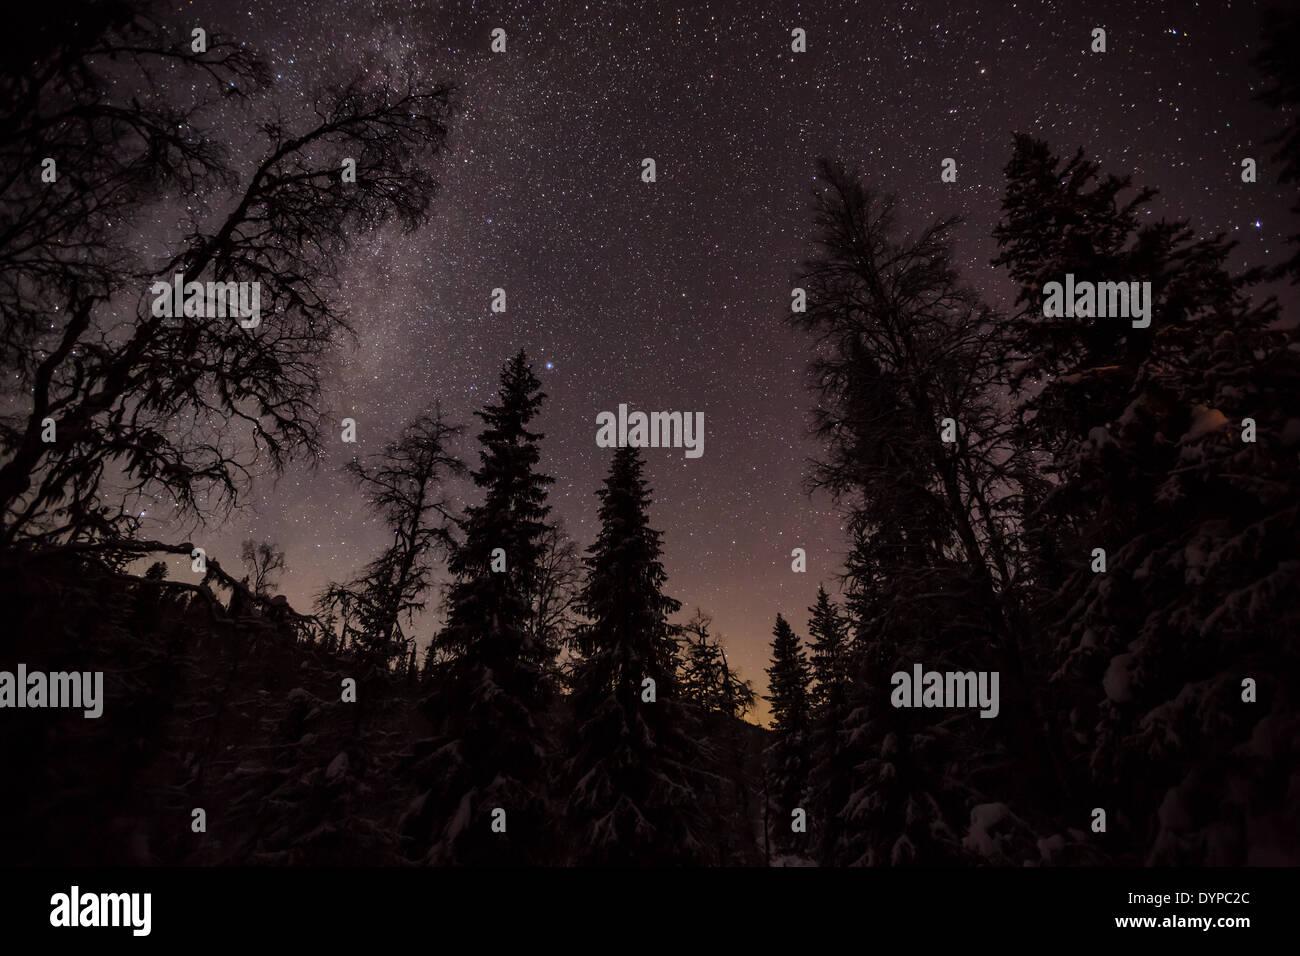 Starry night sky in Korouoma, Posio, Finland, EU - Stock Image